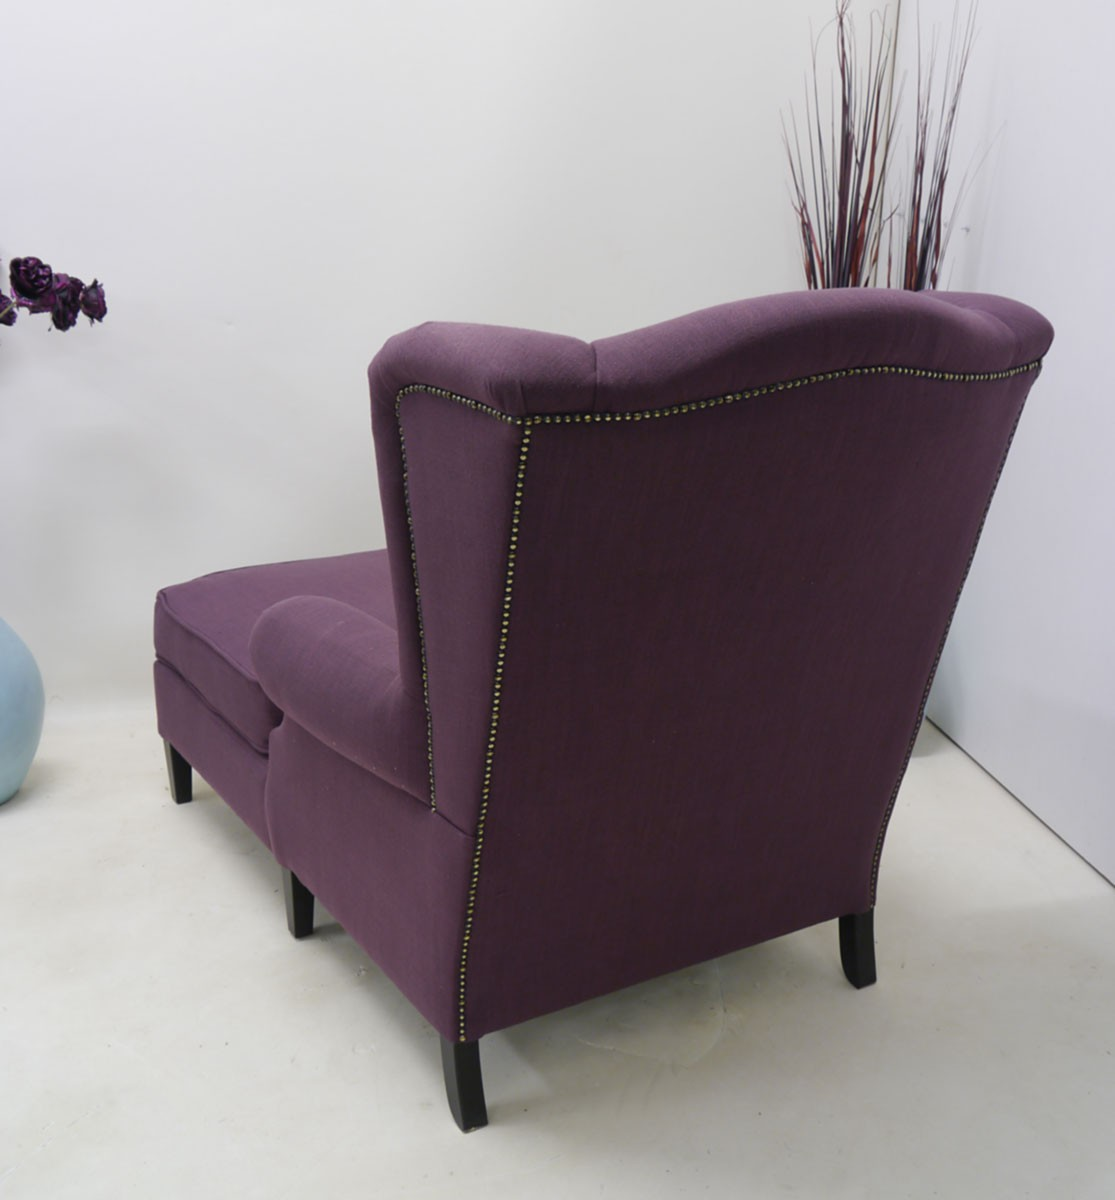 wandspiegel kolonialstil wandspiegel tito im kolonialstil. Black Bedroom Furniture Sets. Home Design Ideas